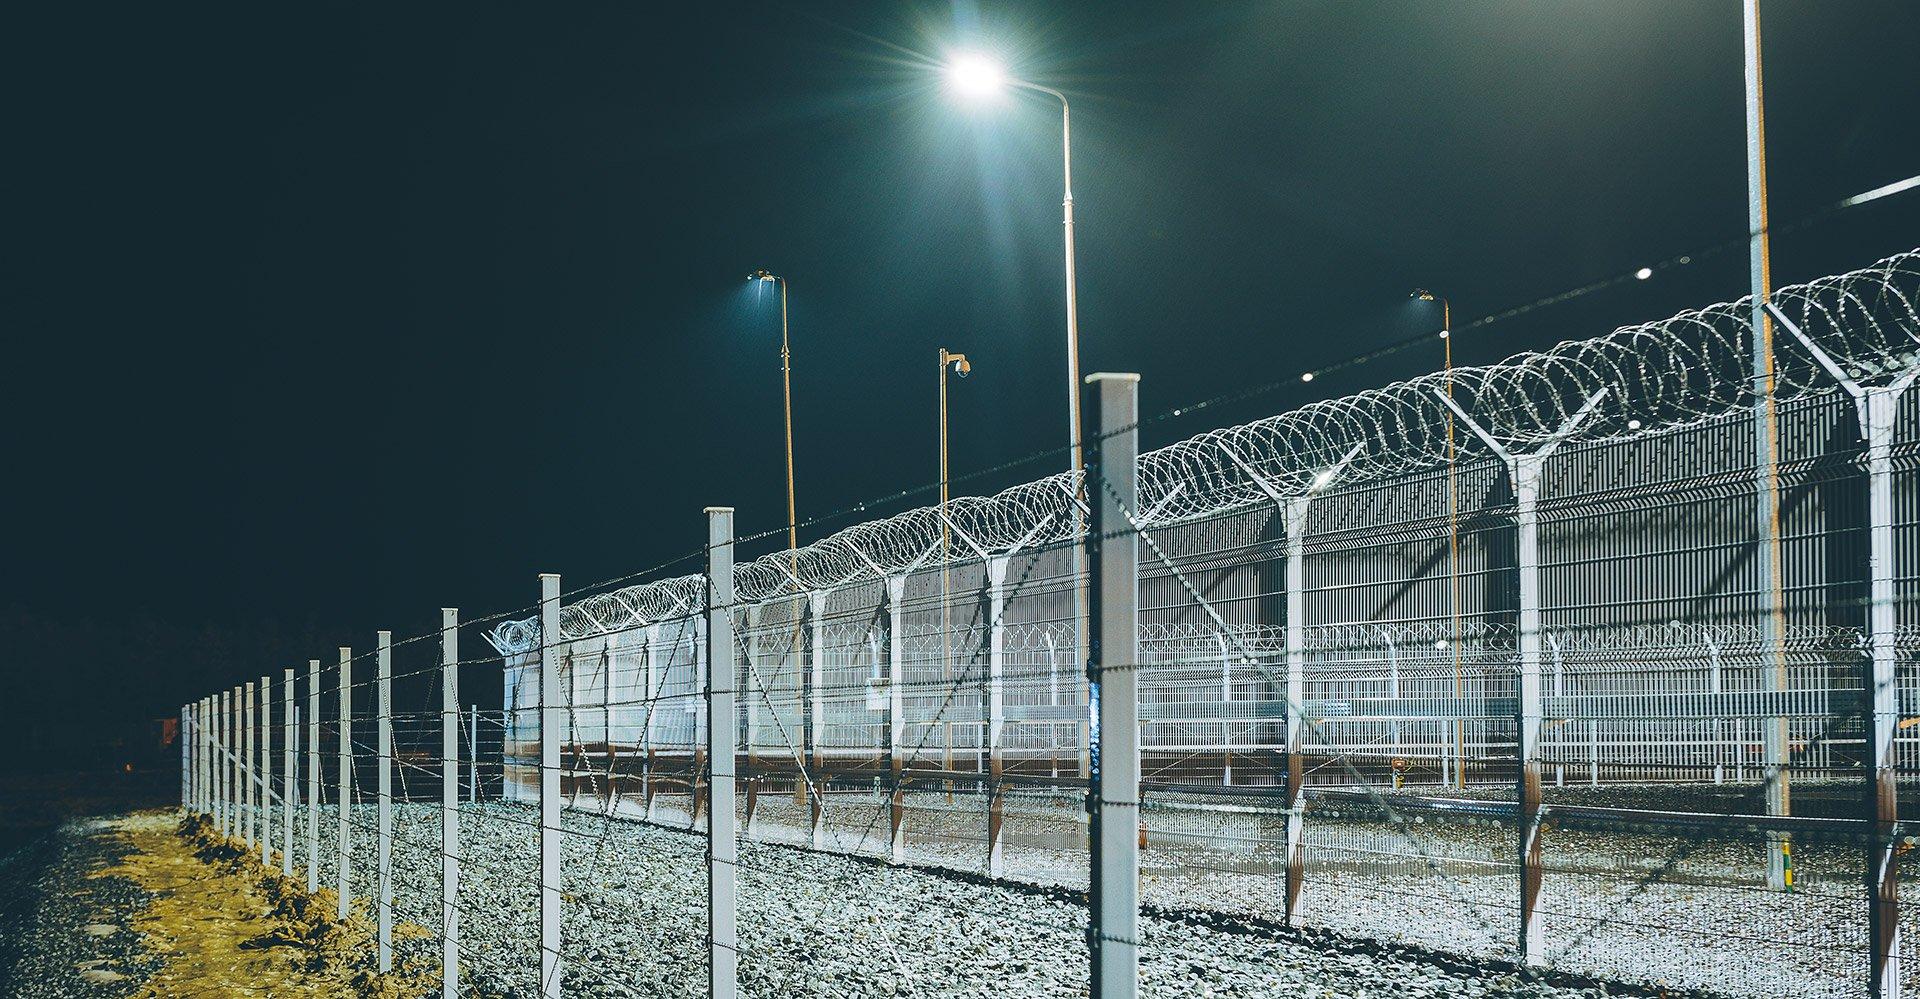 fence-light